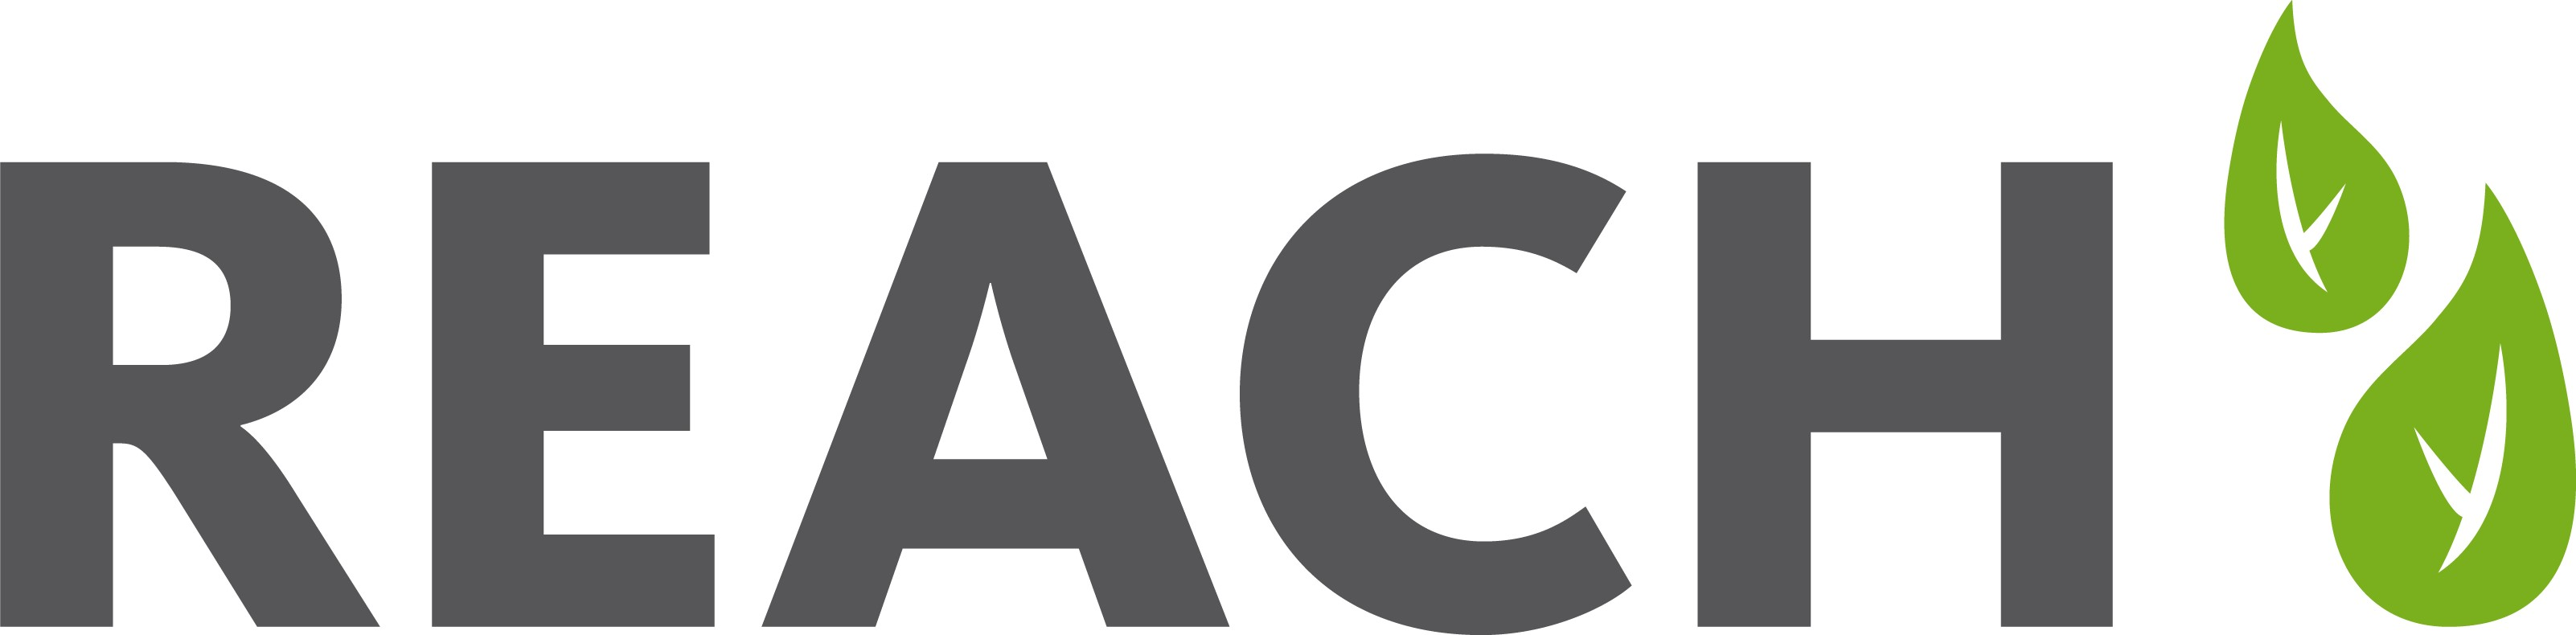 CoastalZinc® Zinc Chloride Completed REACH of EU